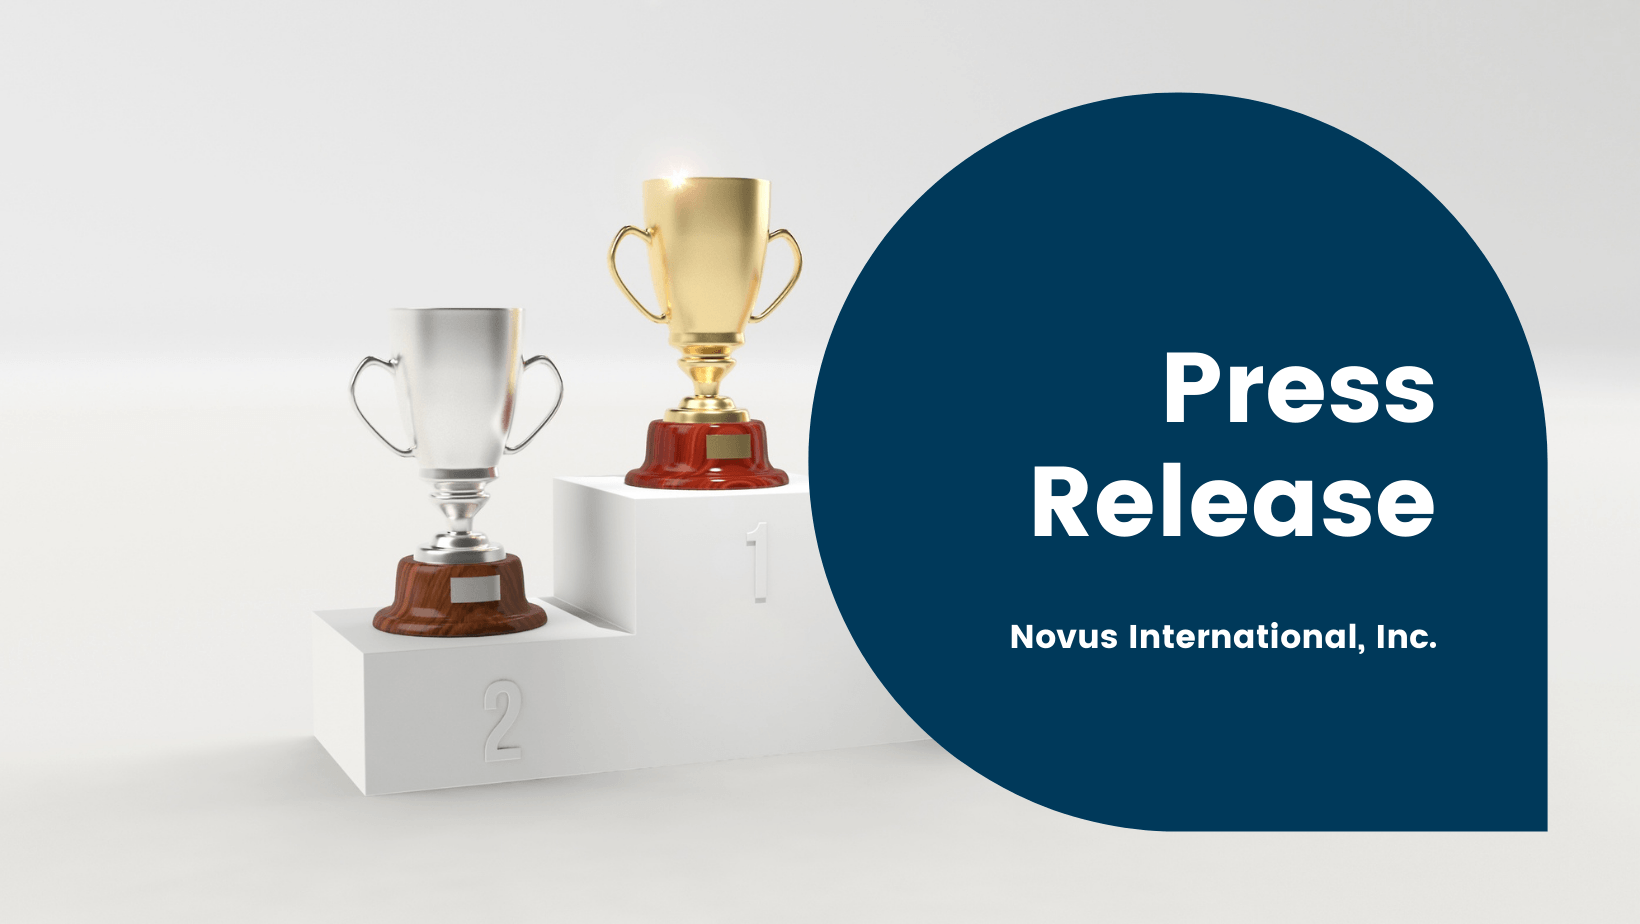 Novus Gives and Receives at this Year's PSA Awards